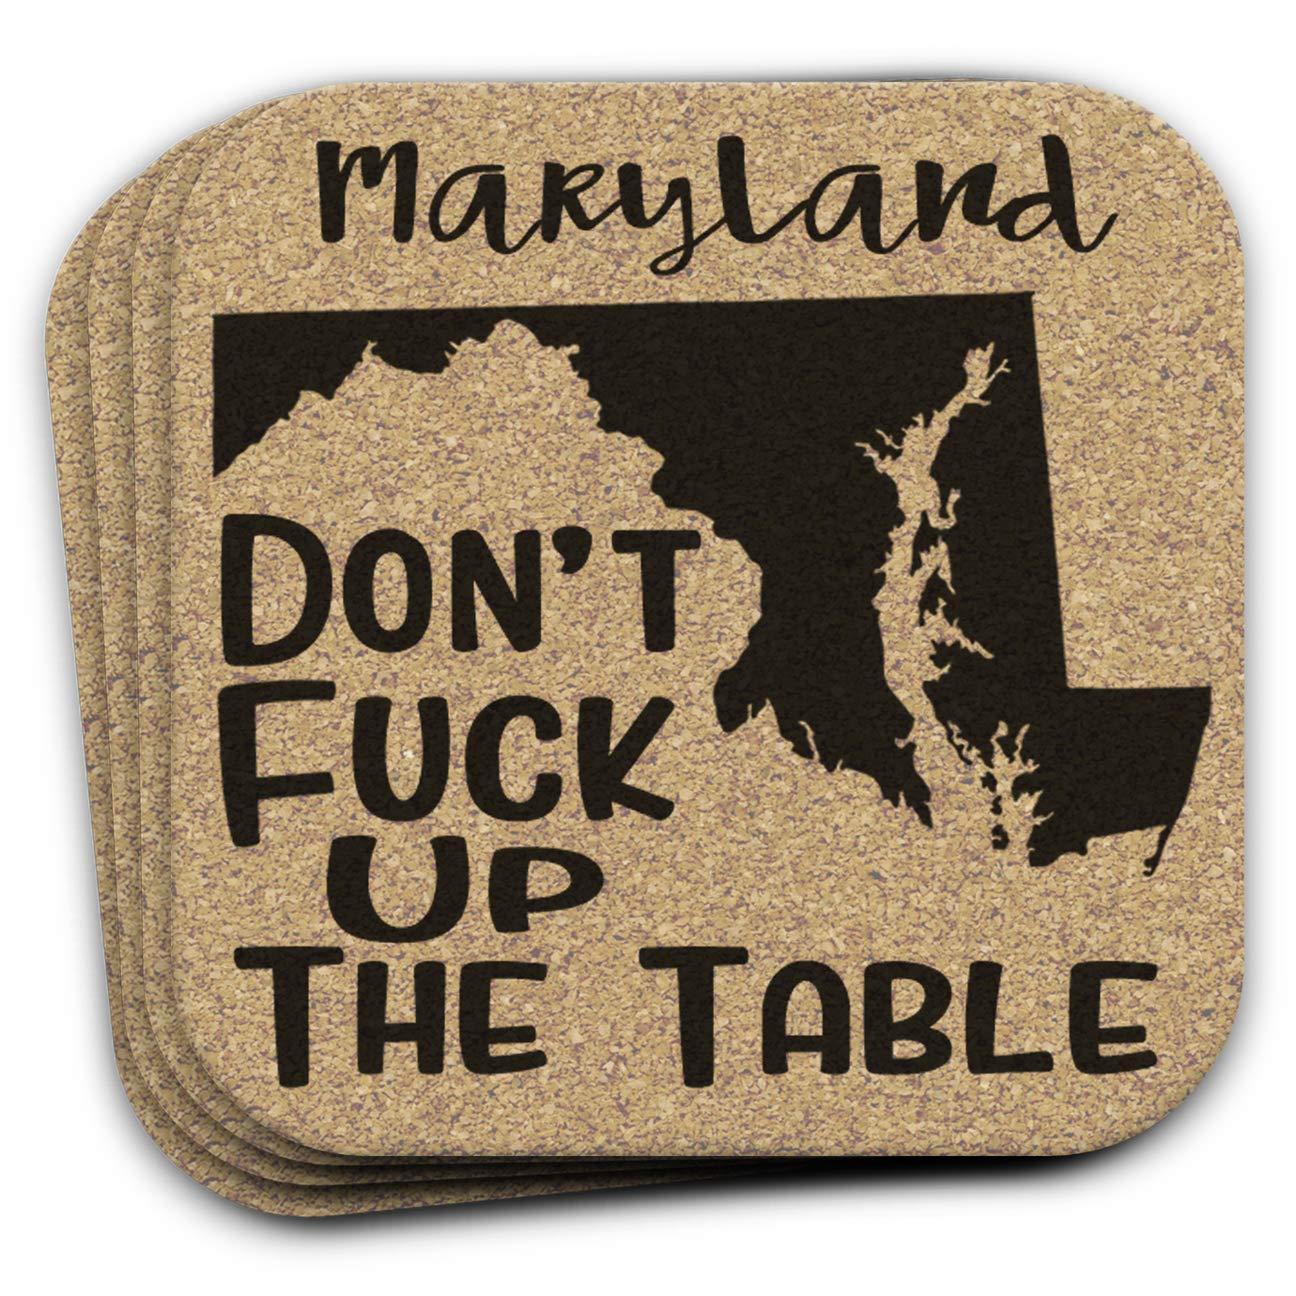 Maryland State Gift Souvenir 4pc Cork Coaster Set